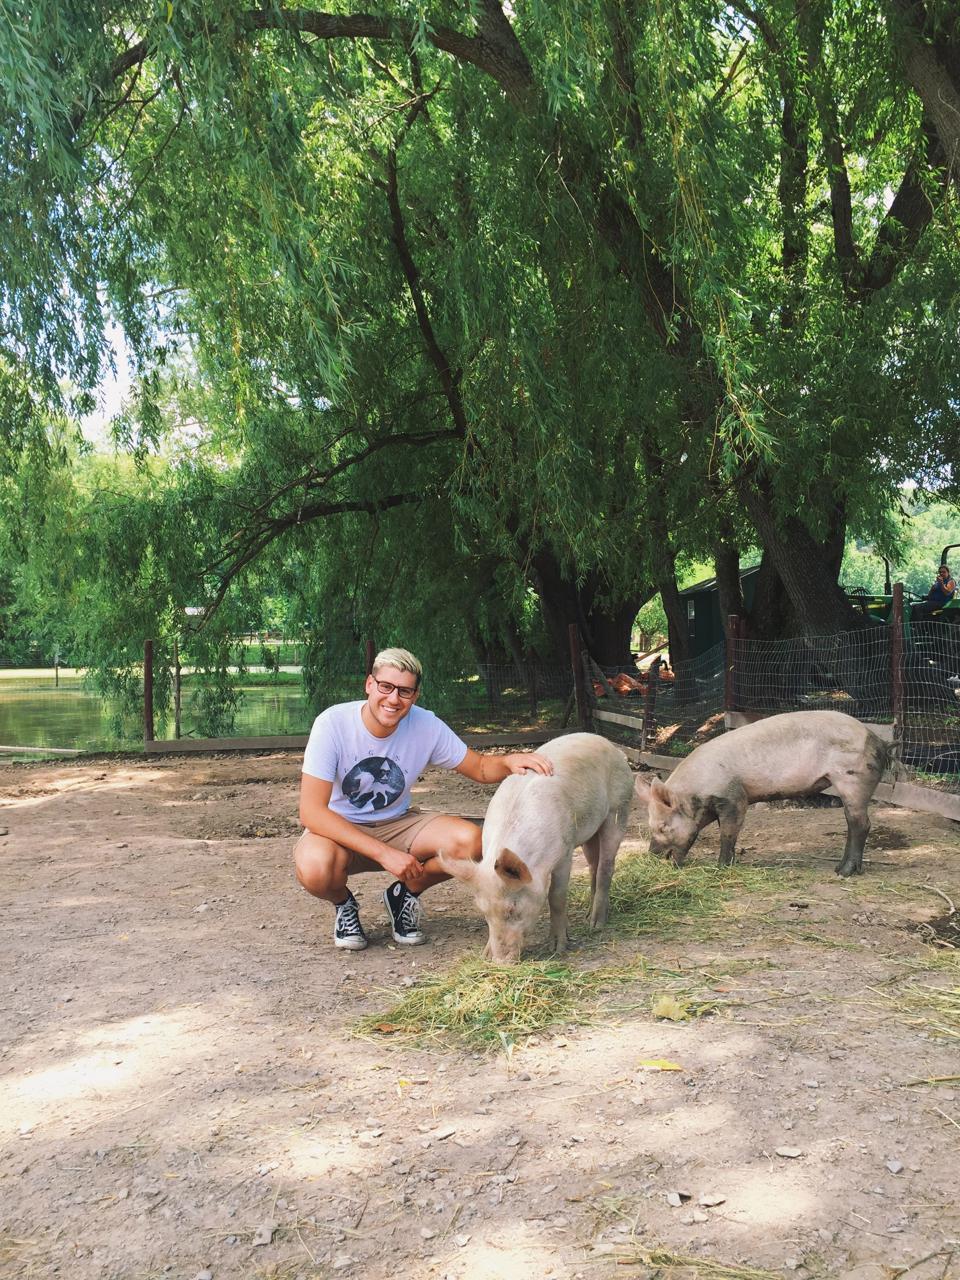 joe loria from world animal protection pets a pig